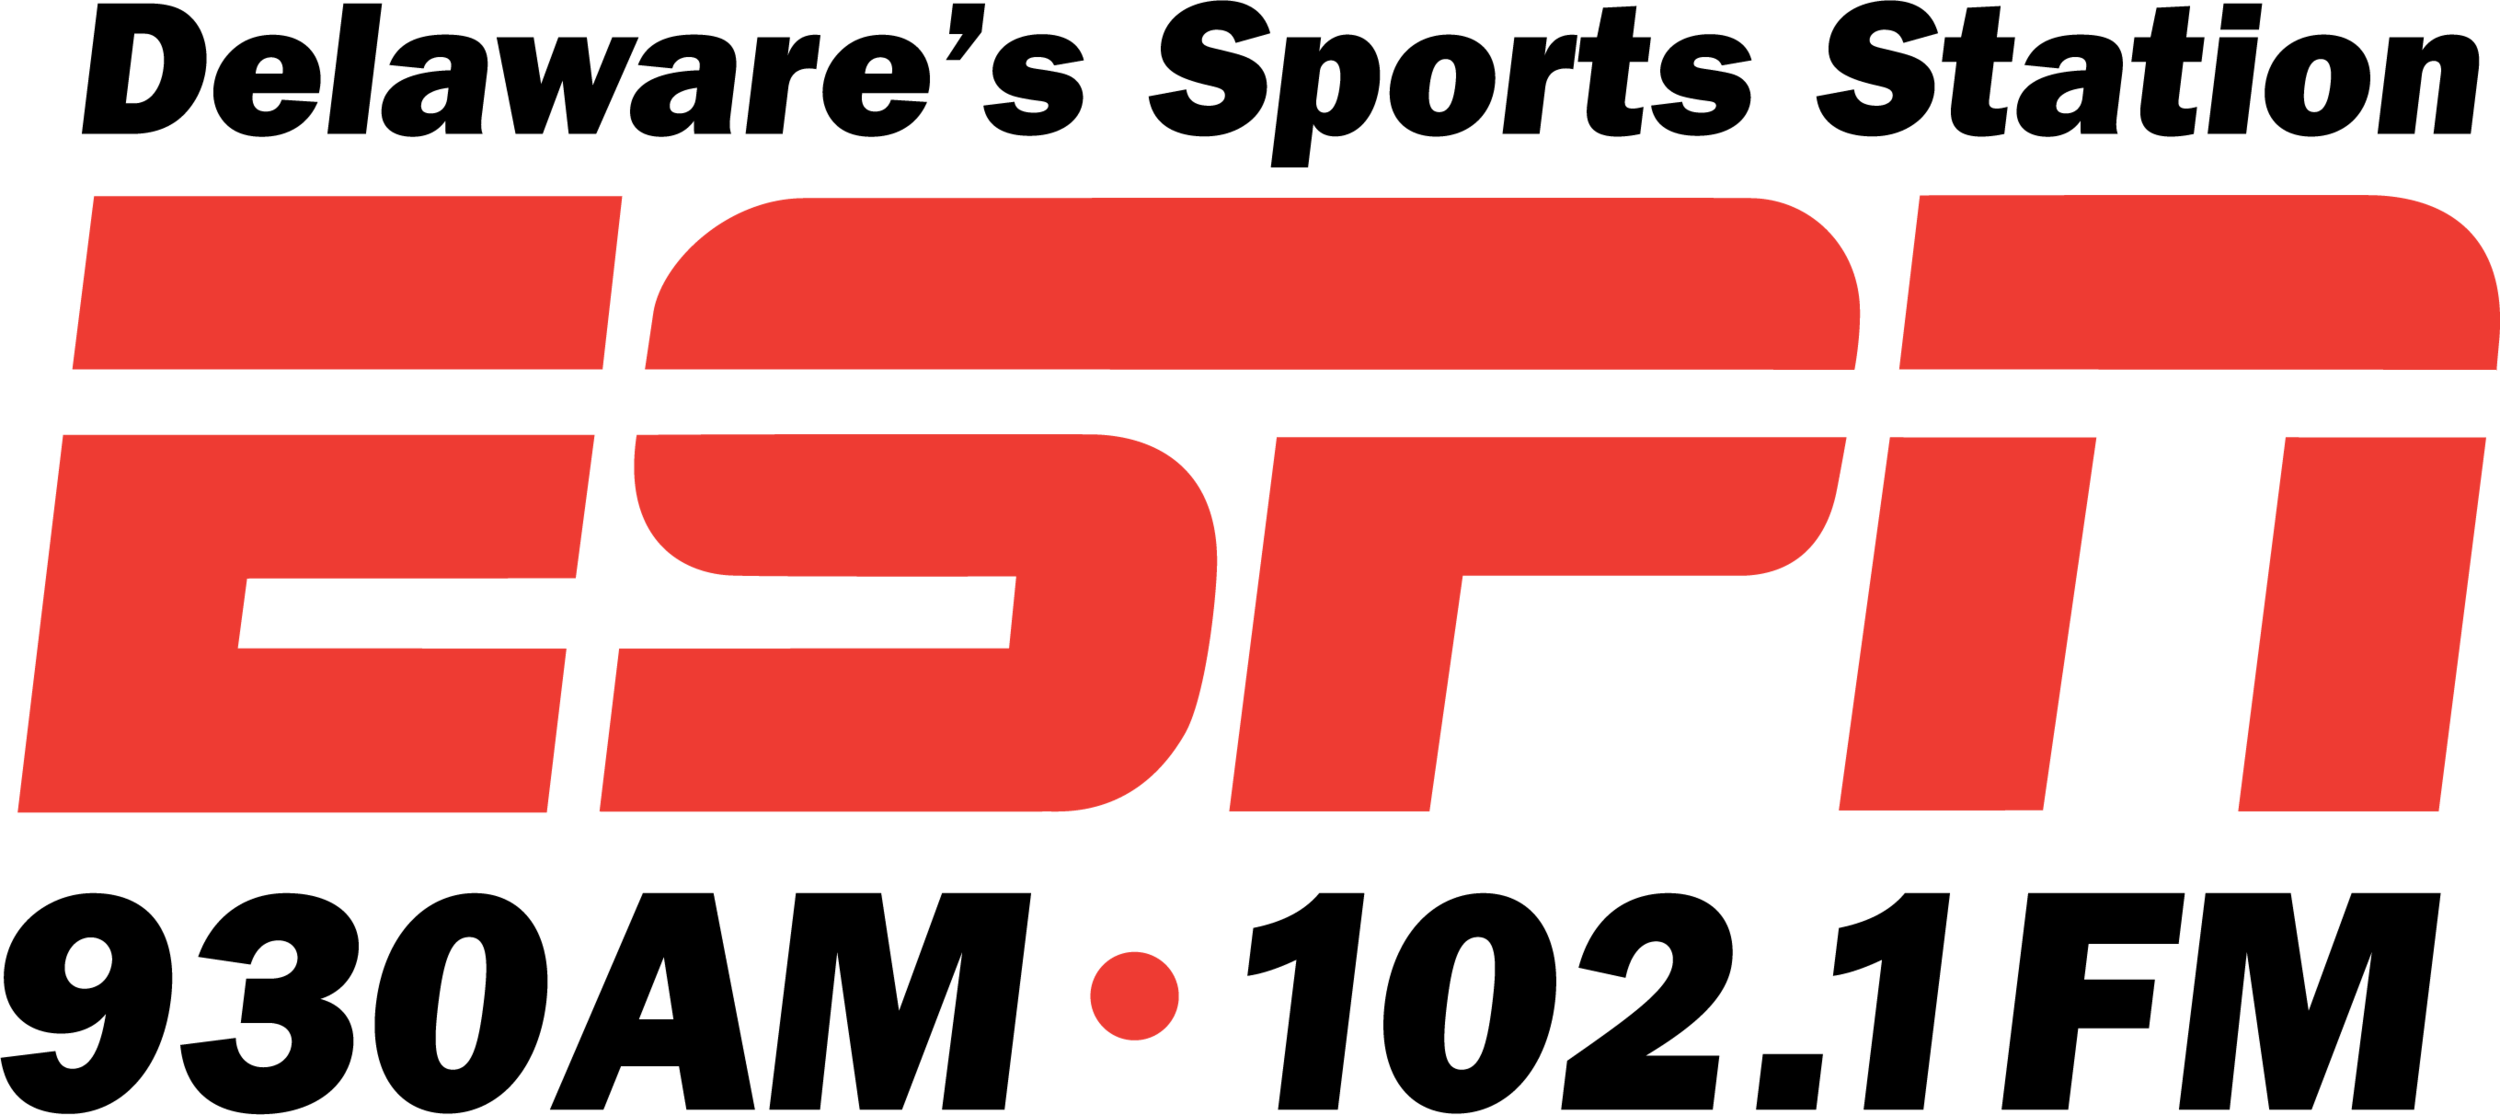 espnradio_logo_1021(1).png